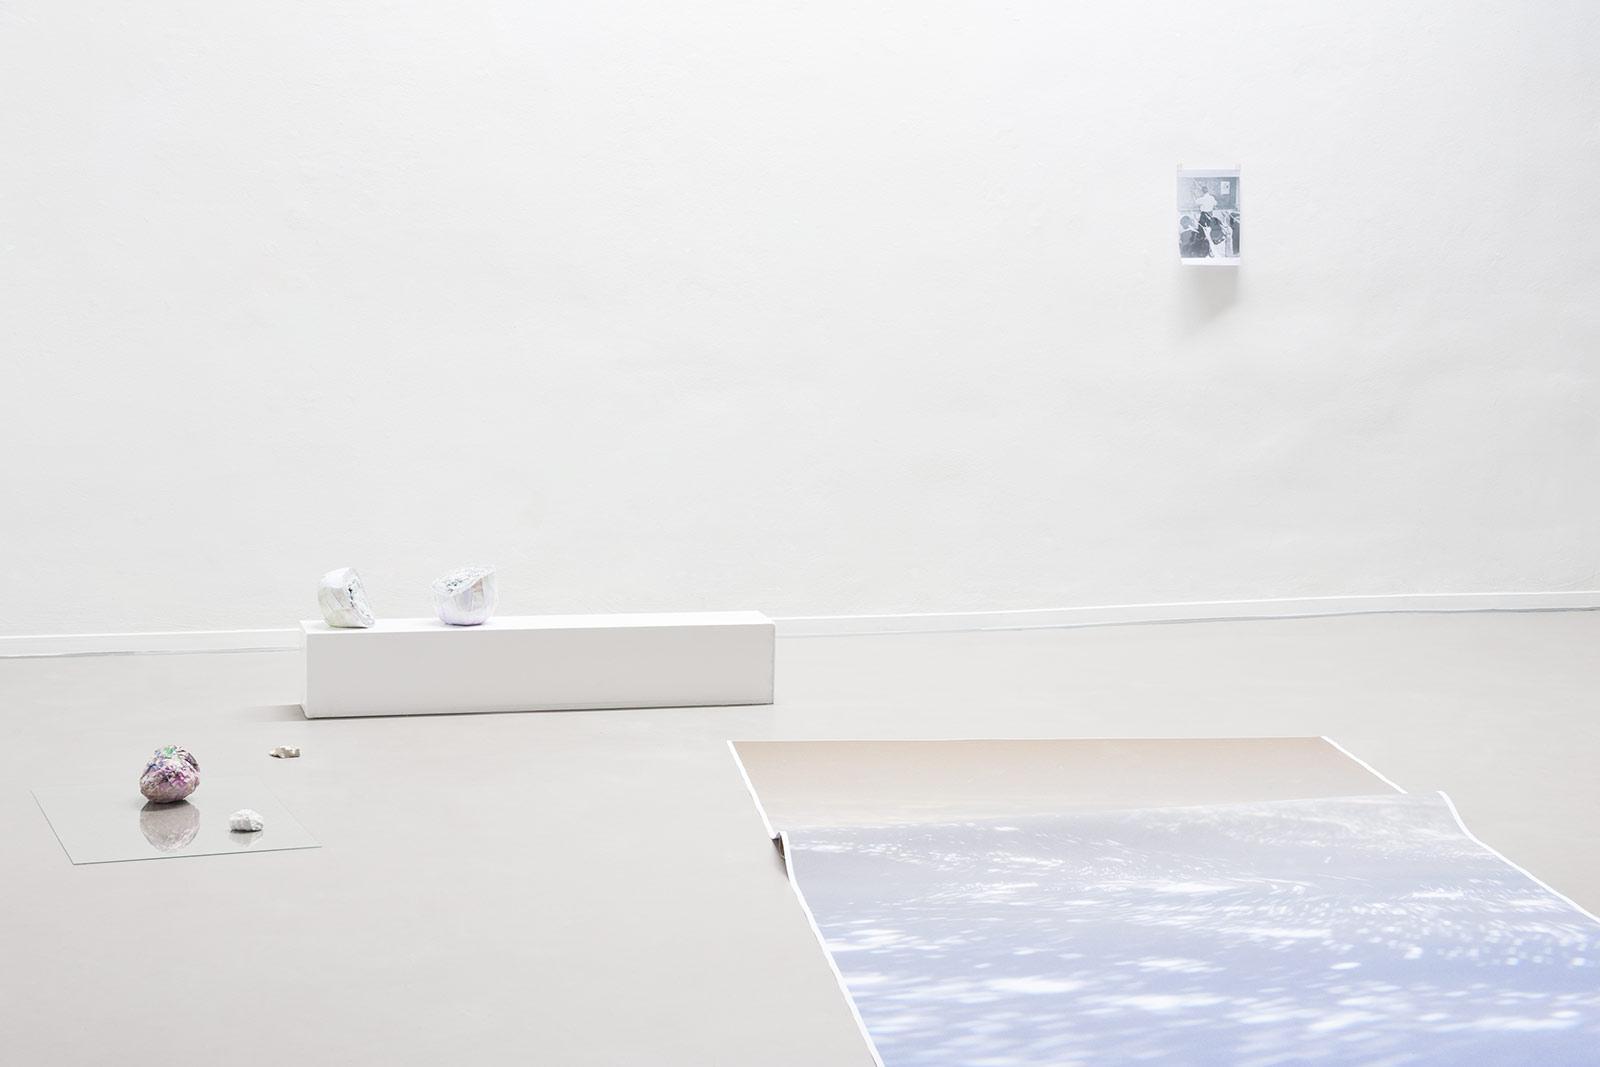 Eva Dittrich, slashslash, Exhibition view, 2015